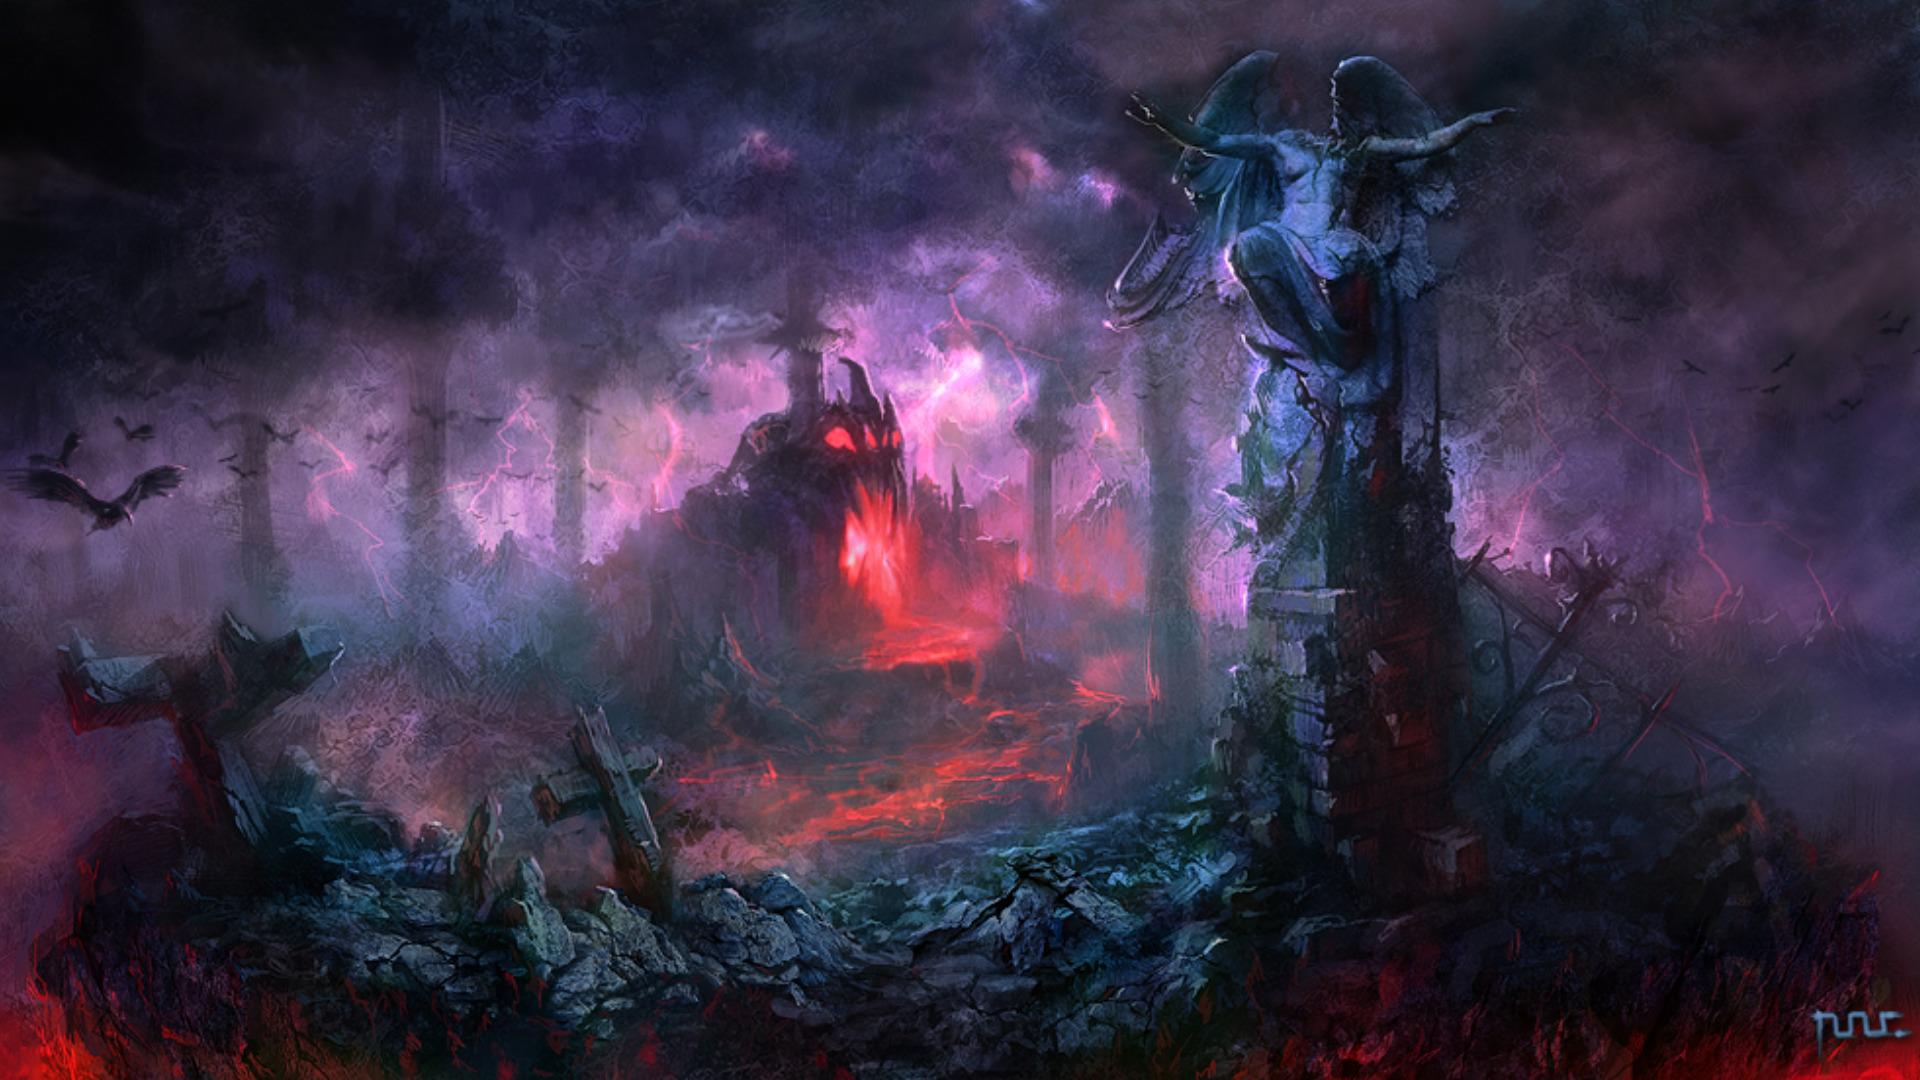 evil landscape background - photo #8